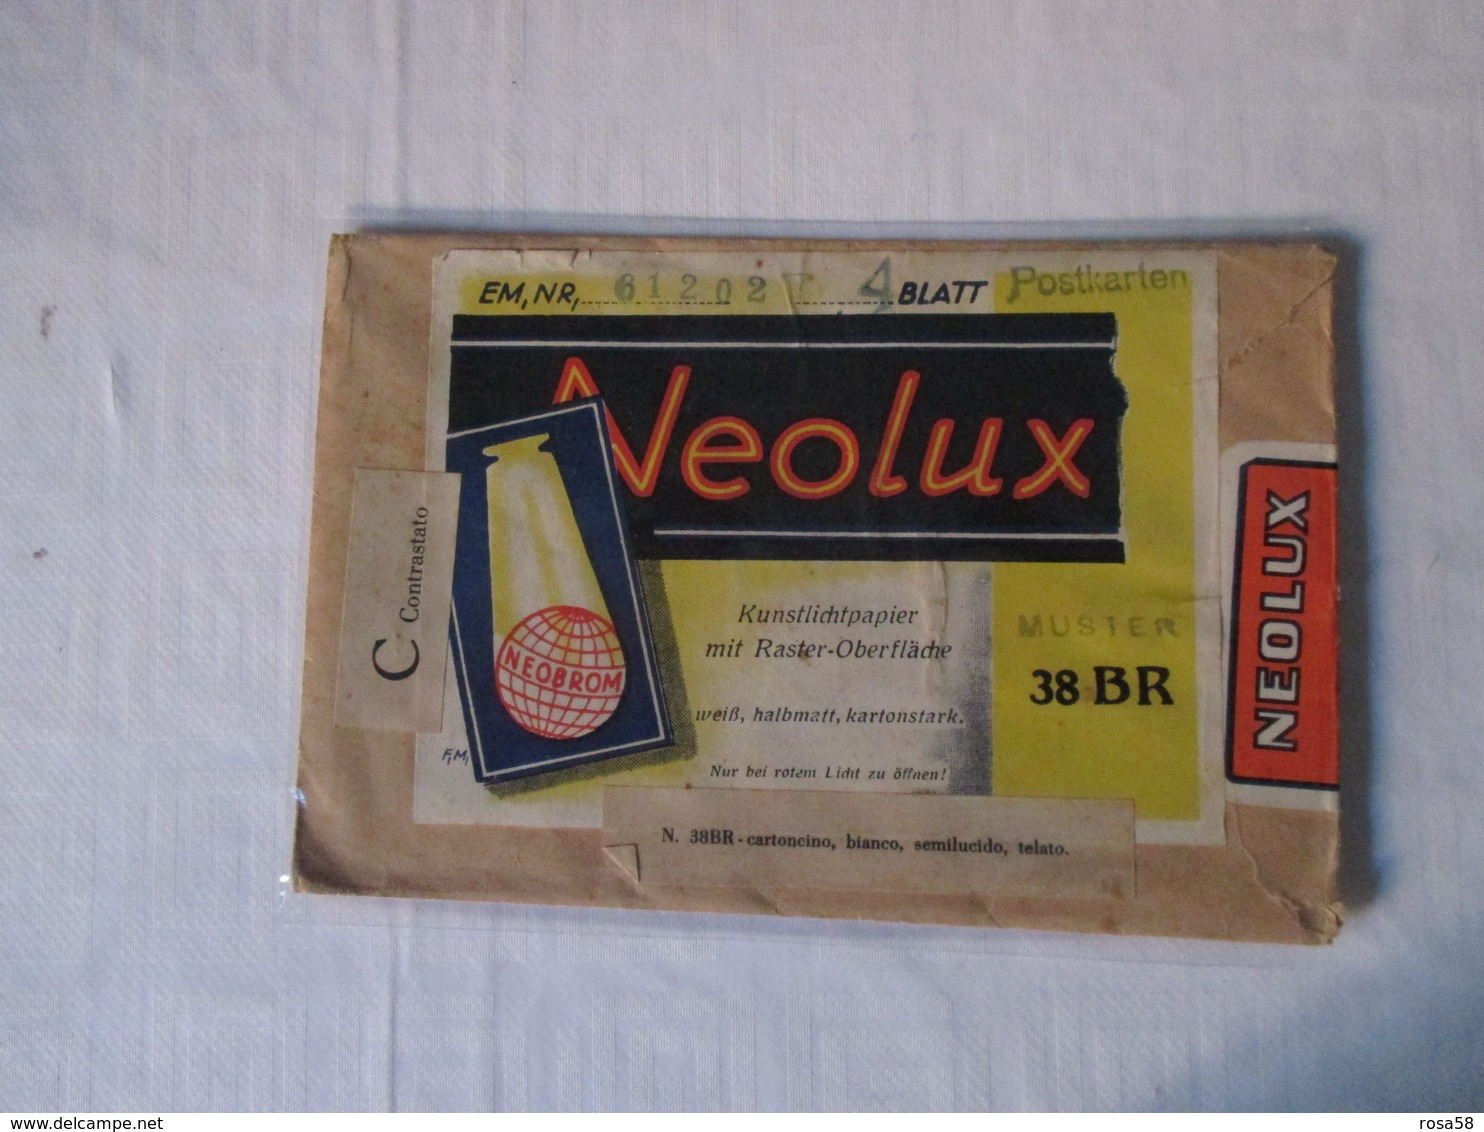 NEOLUX Kunstllichpapier Raster  Neobrom Busta Cartoncino Bianco Semilucido Per FOTO - Photographie